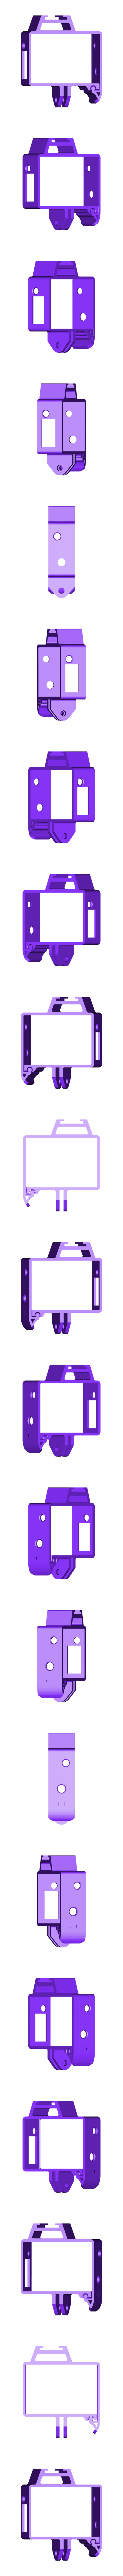 GoPro_Hero_Frame_w_Hot_Shoe_Mount.stl Download free STL file GoPro Hero Frame w Hot Shoe Mount • 3D printer object, DanielNoree